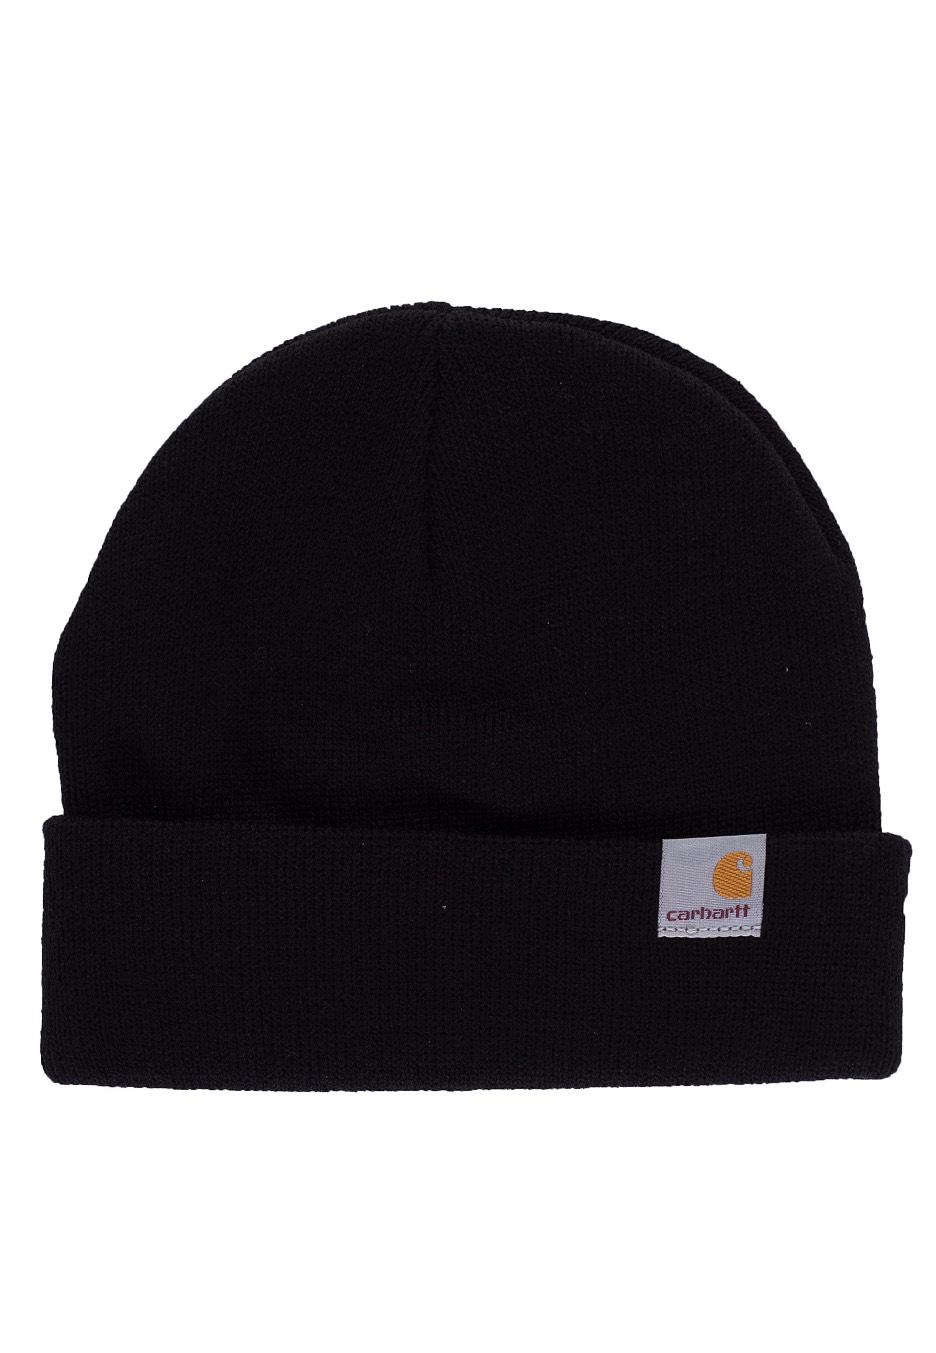 Carhartt WIP - Stratus Hat Low Black - Beanie - Streetwear Shop -  Impericon.com UK f870a0e1868